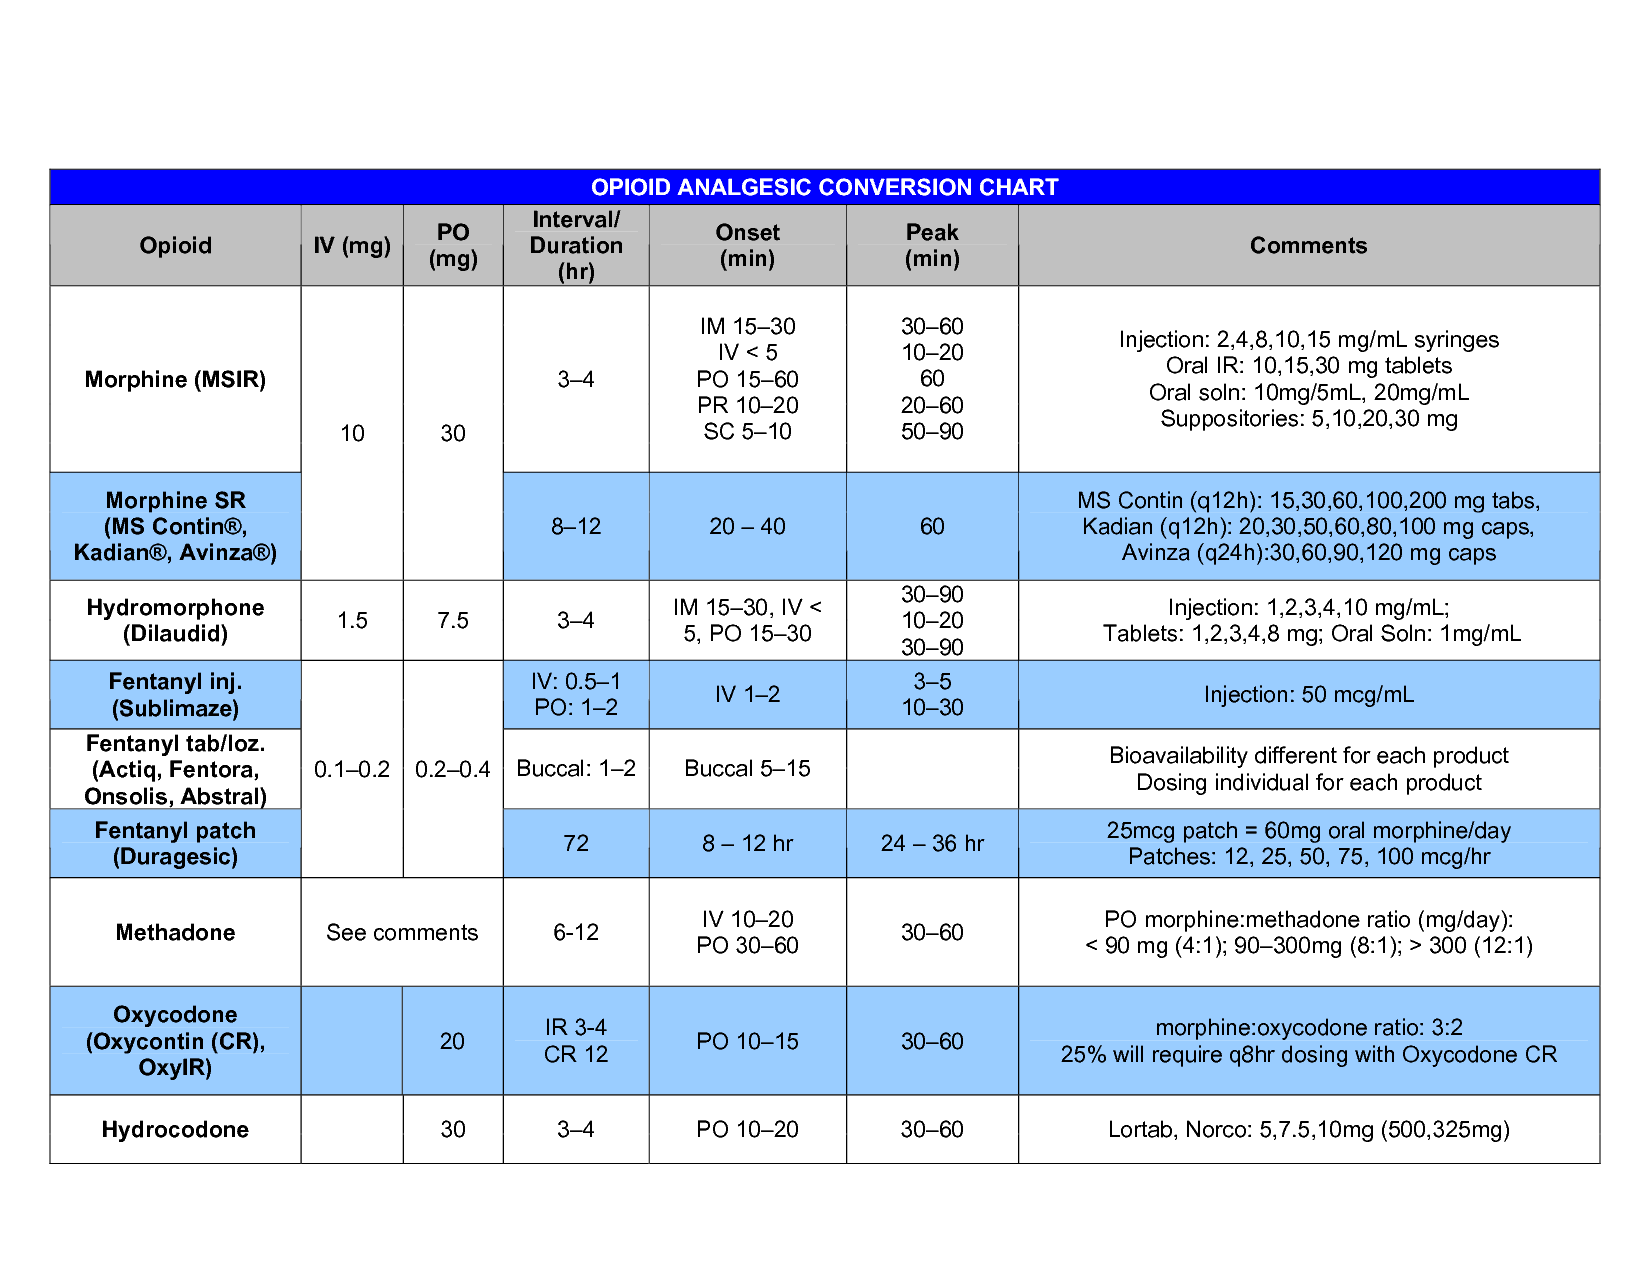 Opiate dosing chart opioid analgesic conversion iv mg po also rh pinterest